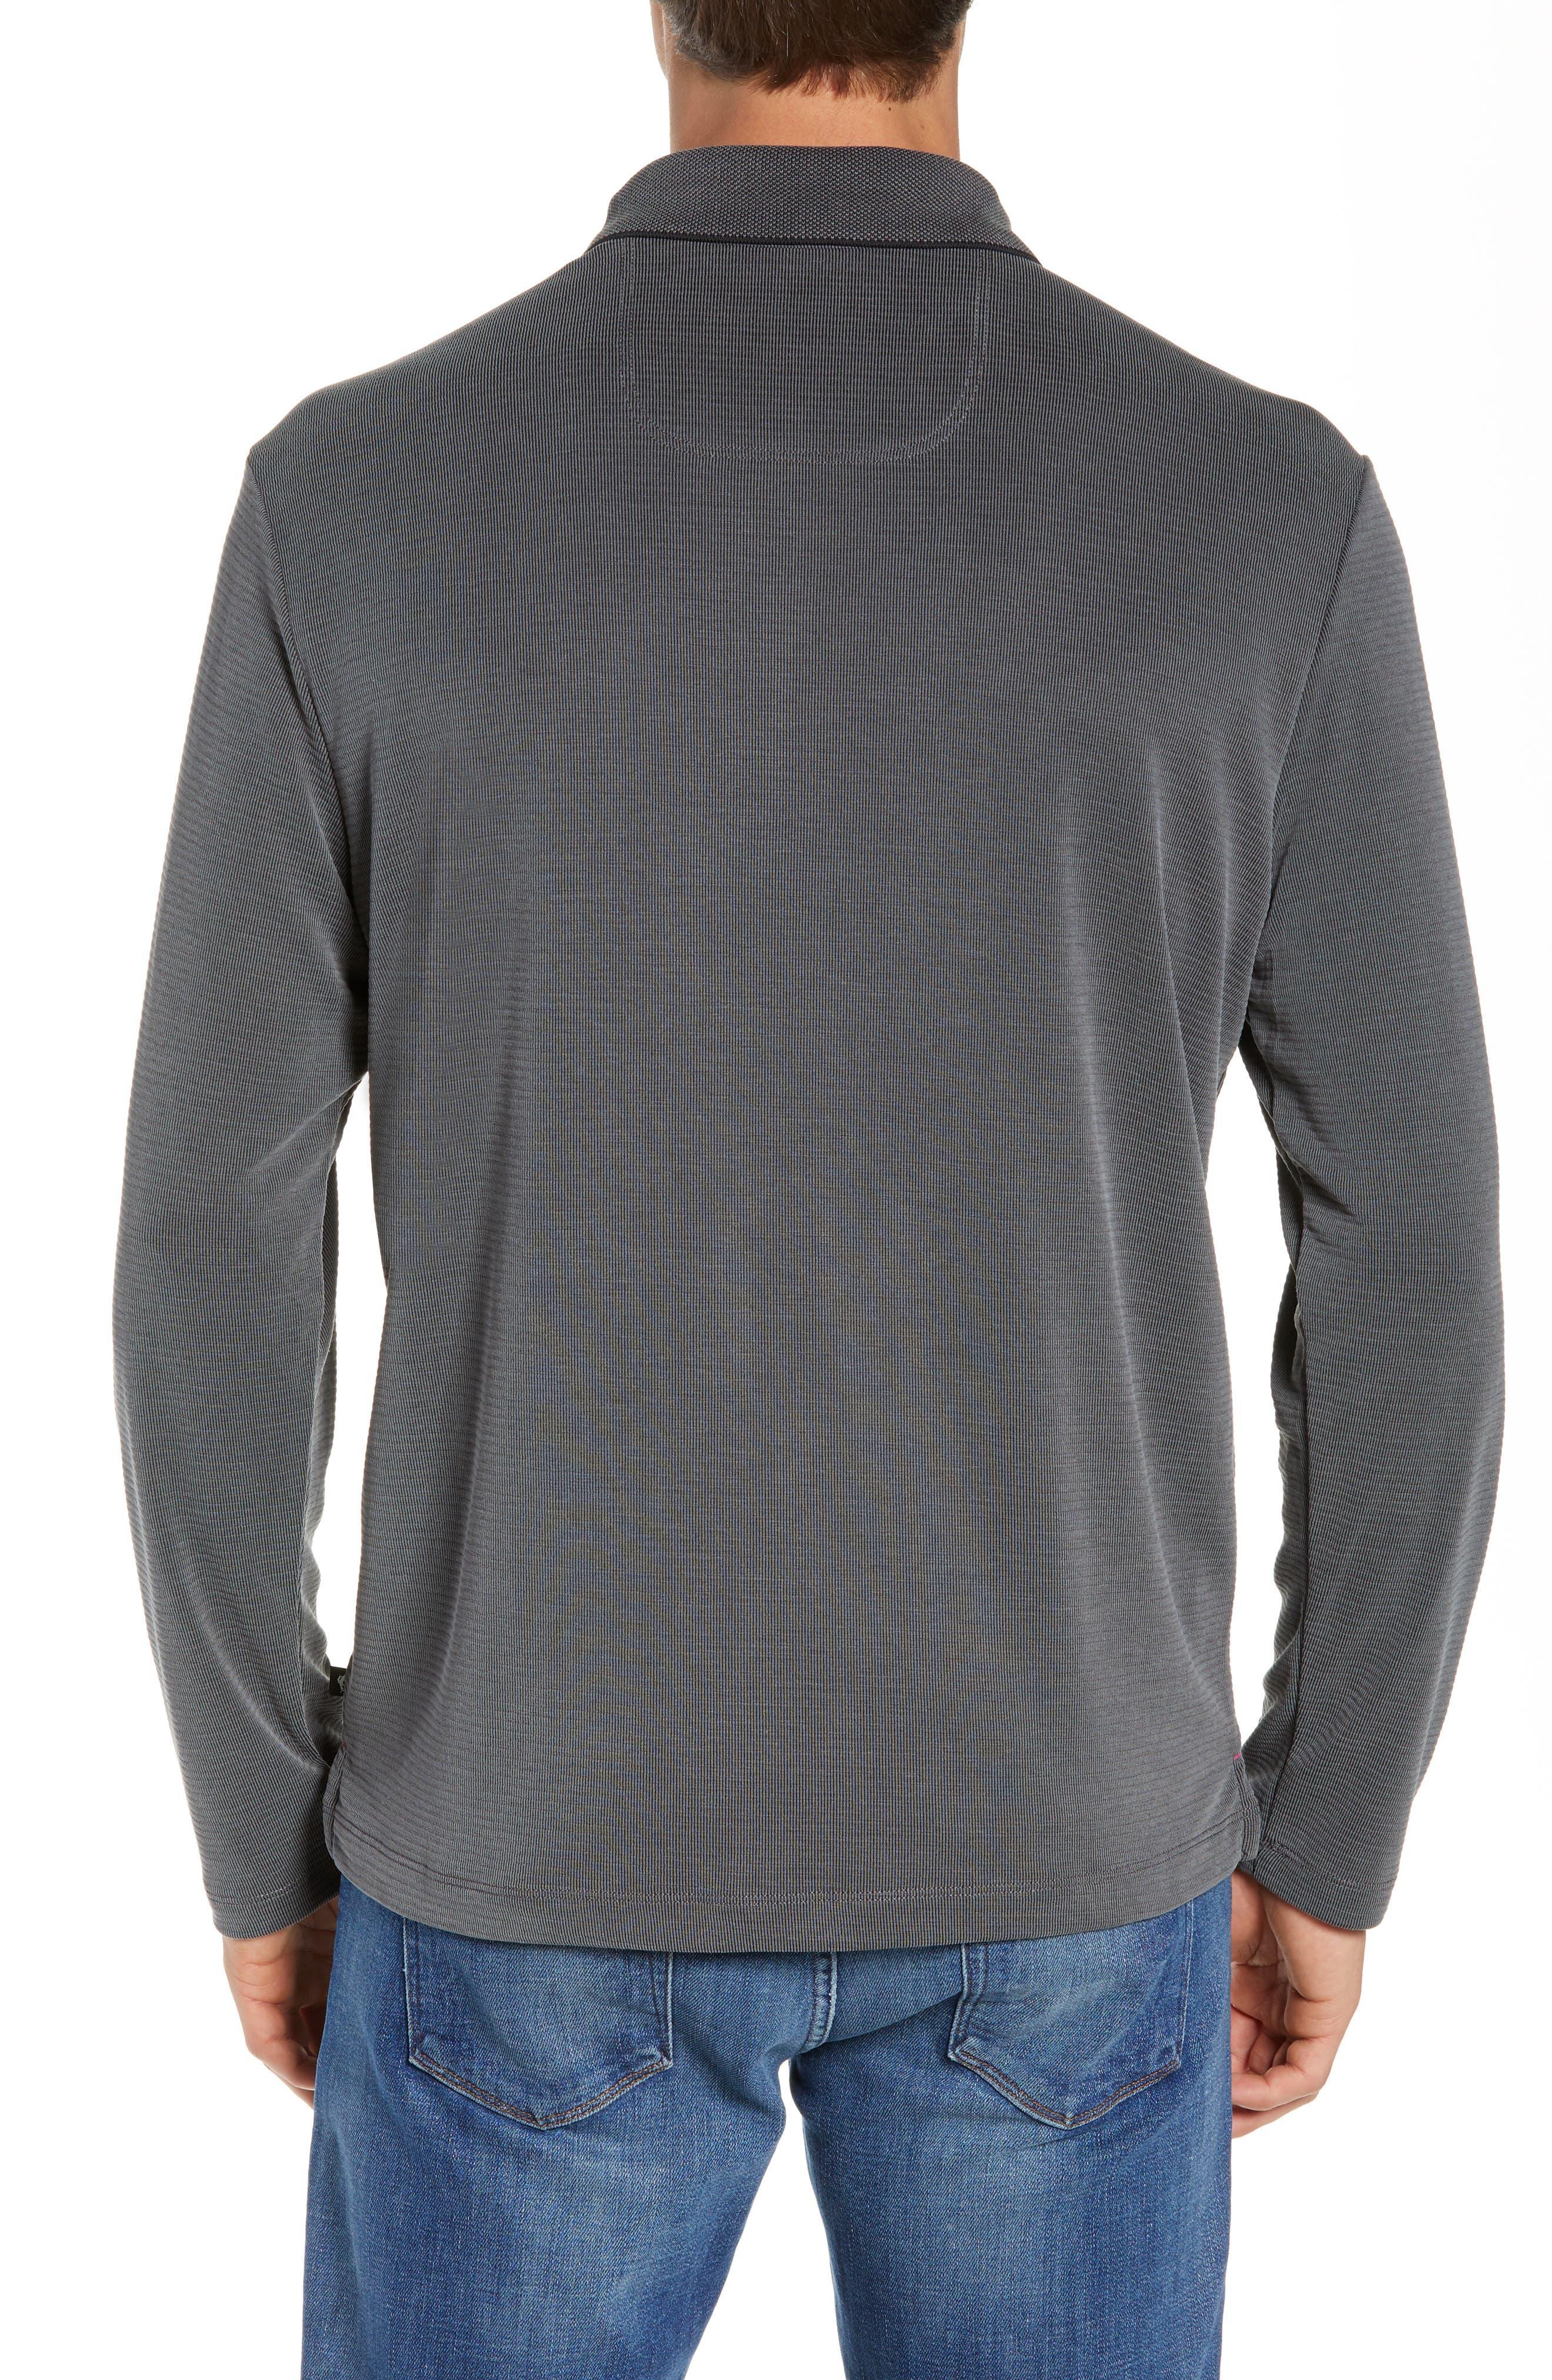 Coastal Crest Regular Fit Polo,                             Alternate thumbnail 2, color,                             BLACK